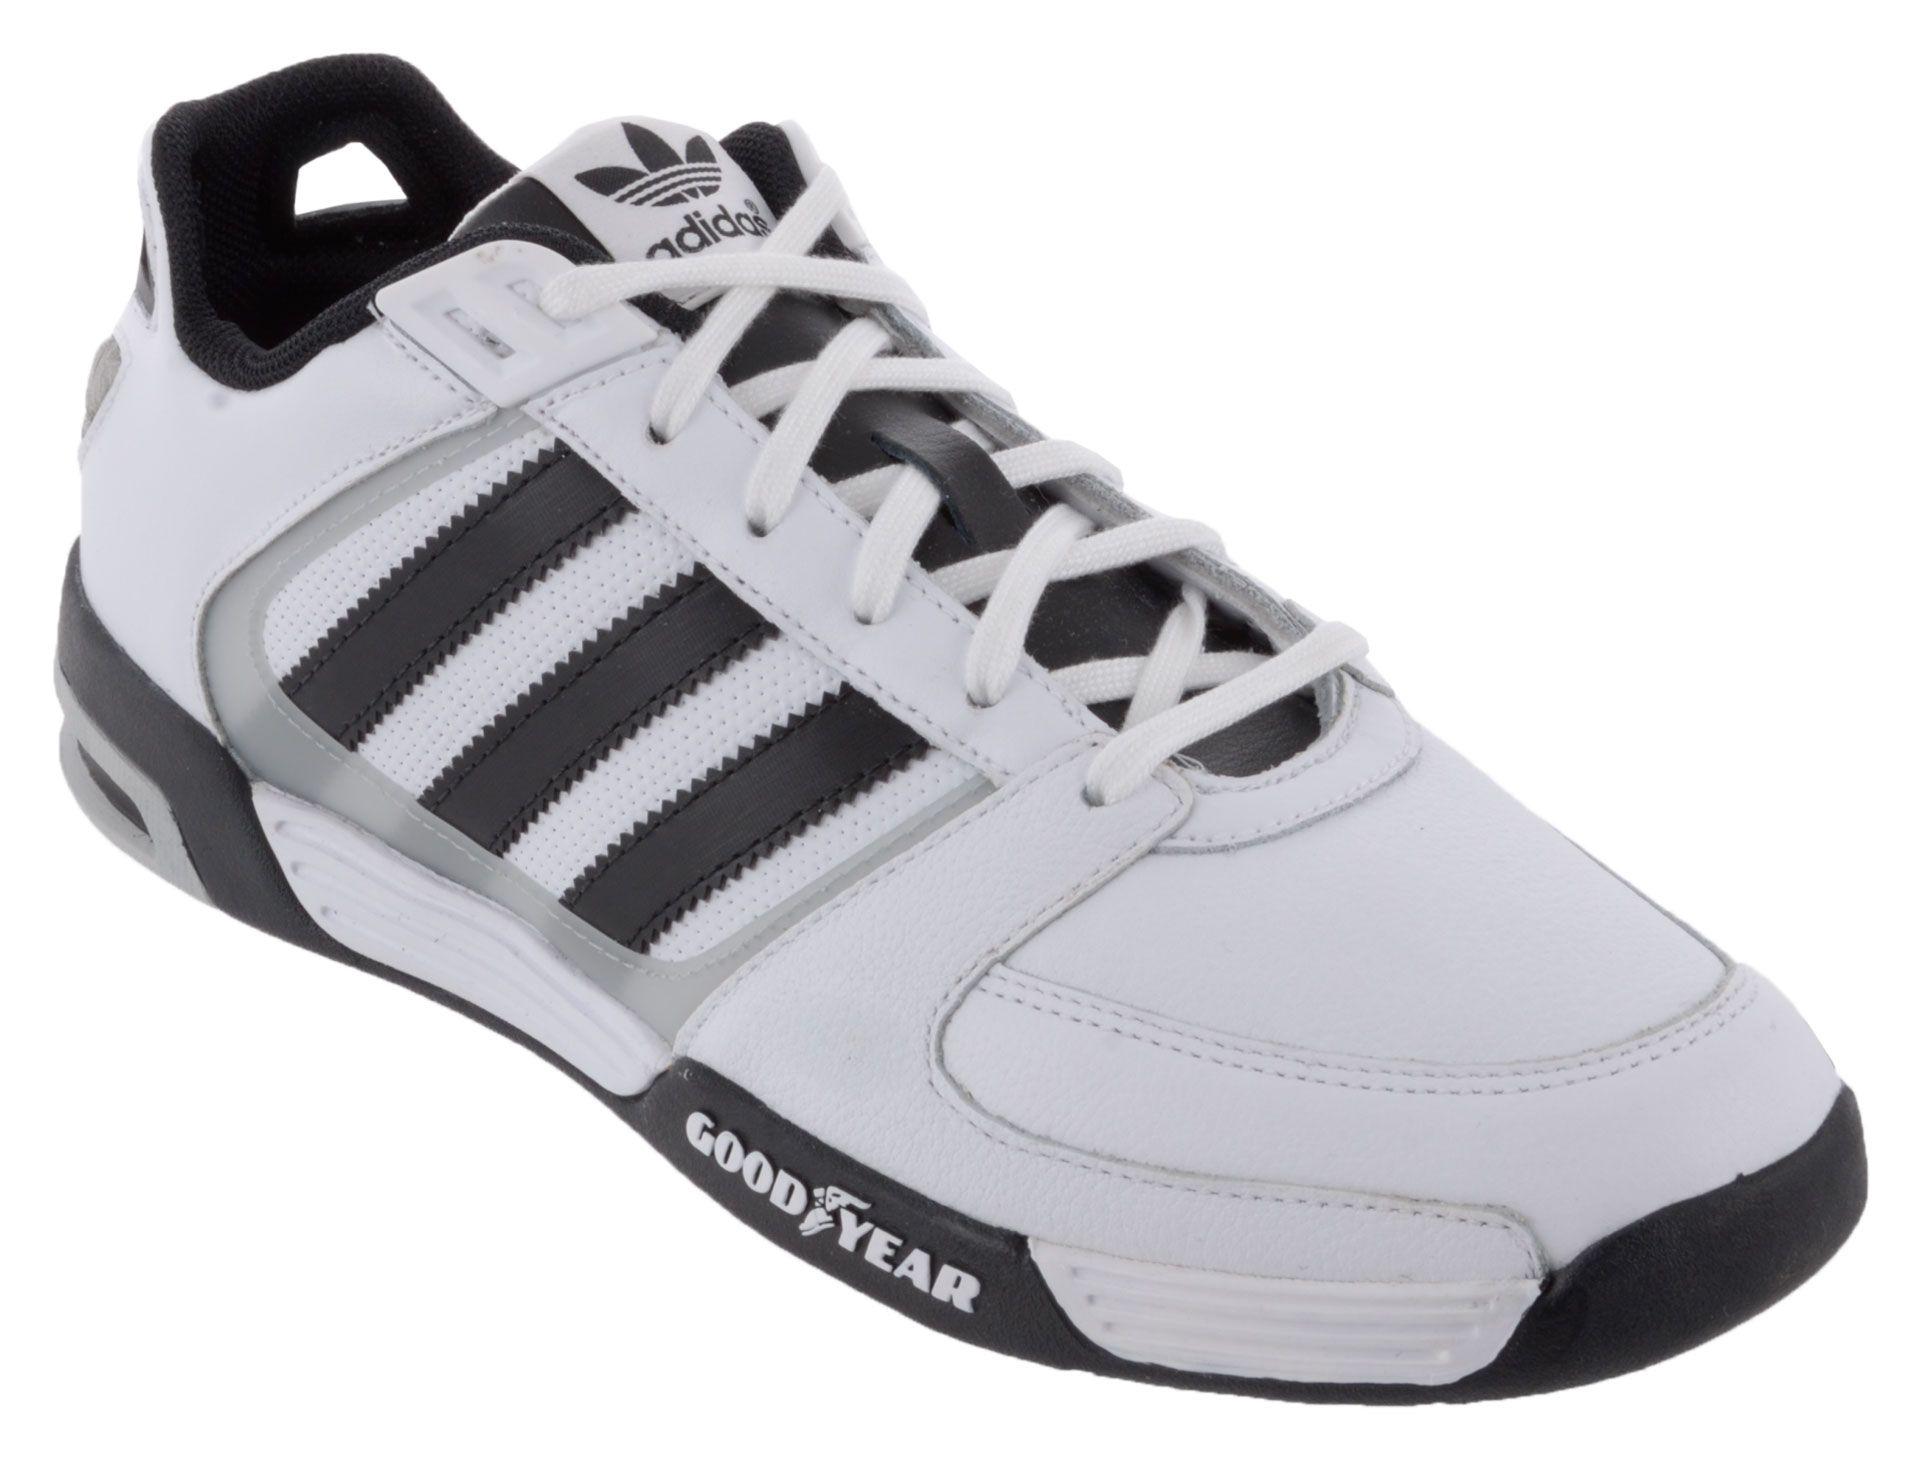 Adidas Goodyear Driver